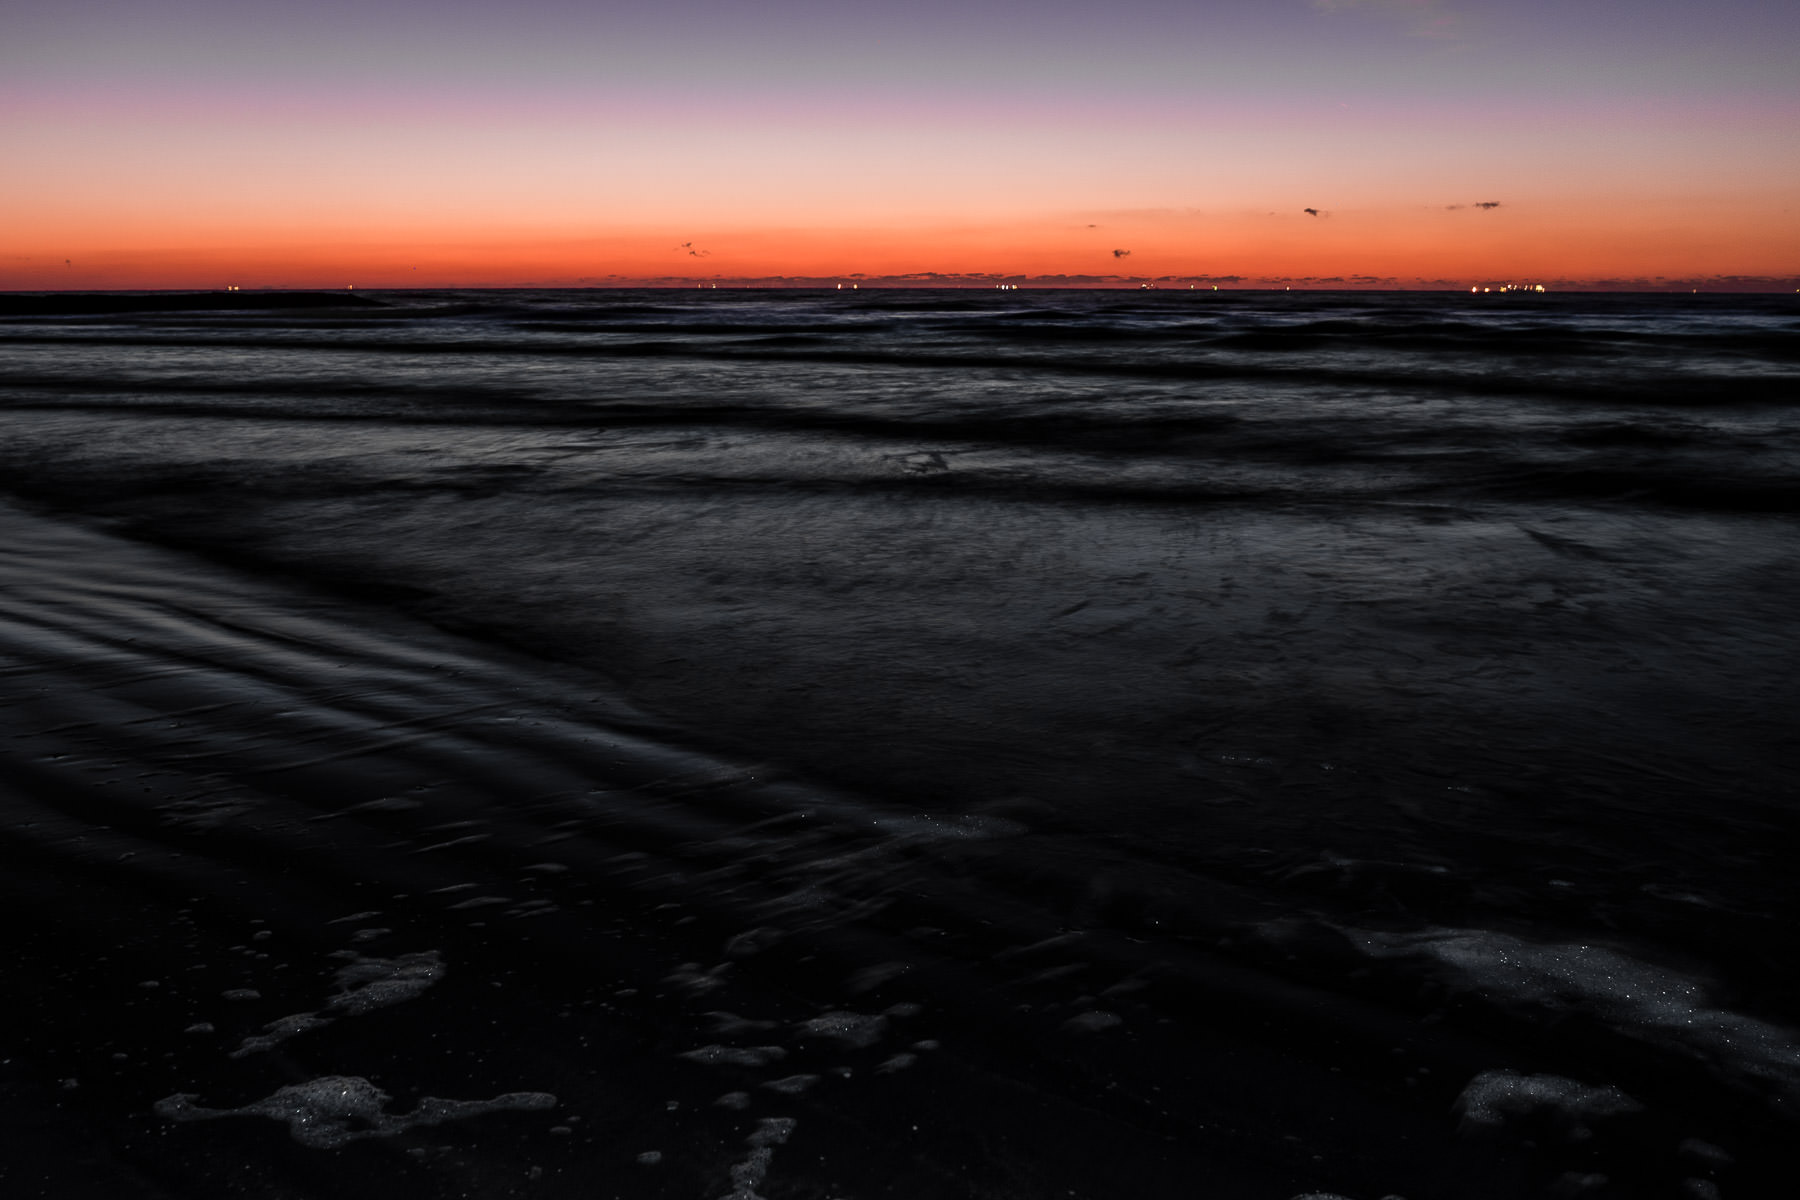 Ships' lights dot the horizon as the sun rises over the Gulf of Mexico as seen from a Galveston, Texas, beach.